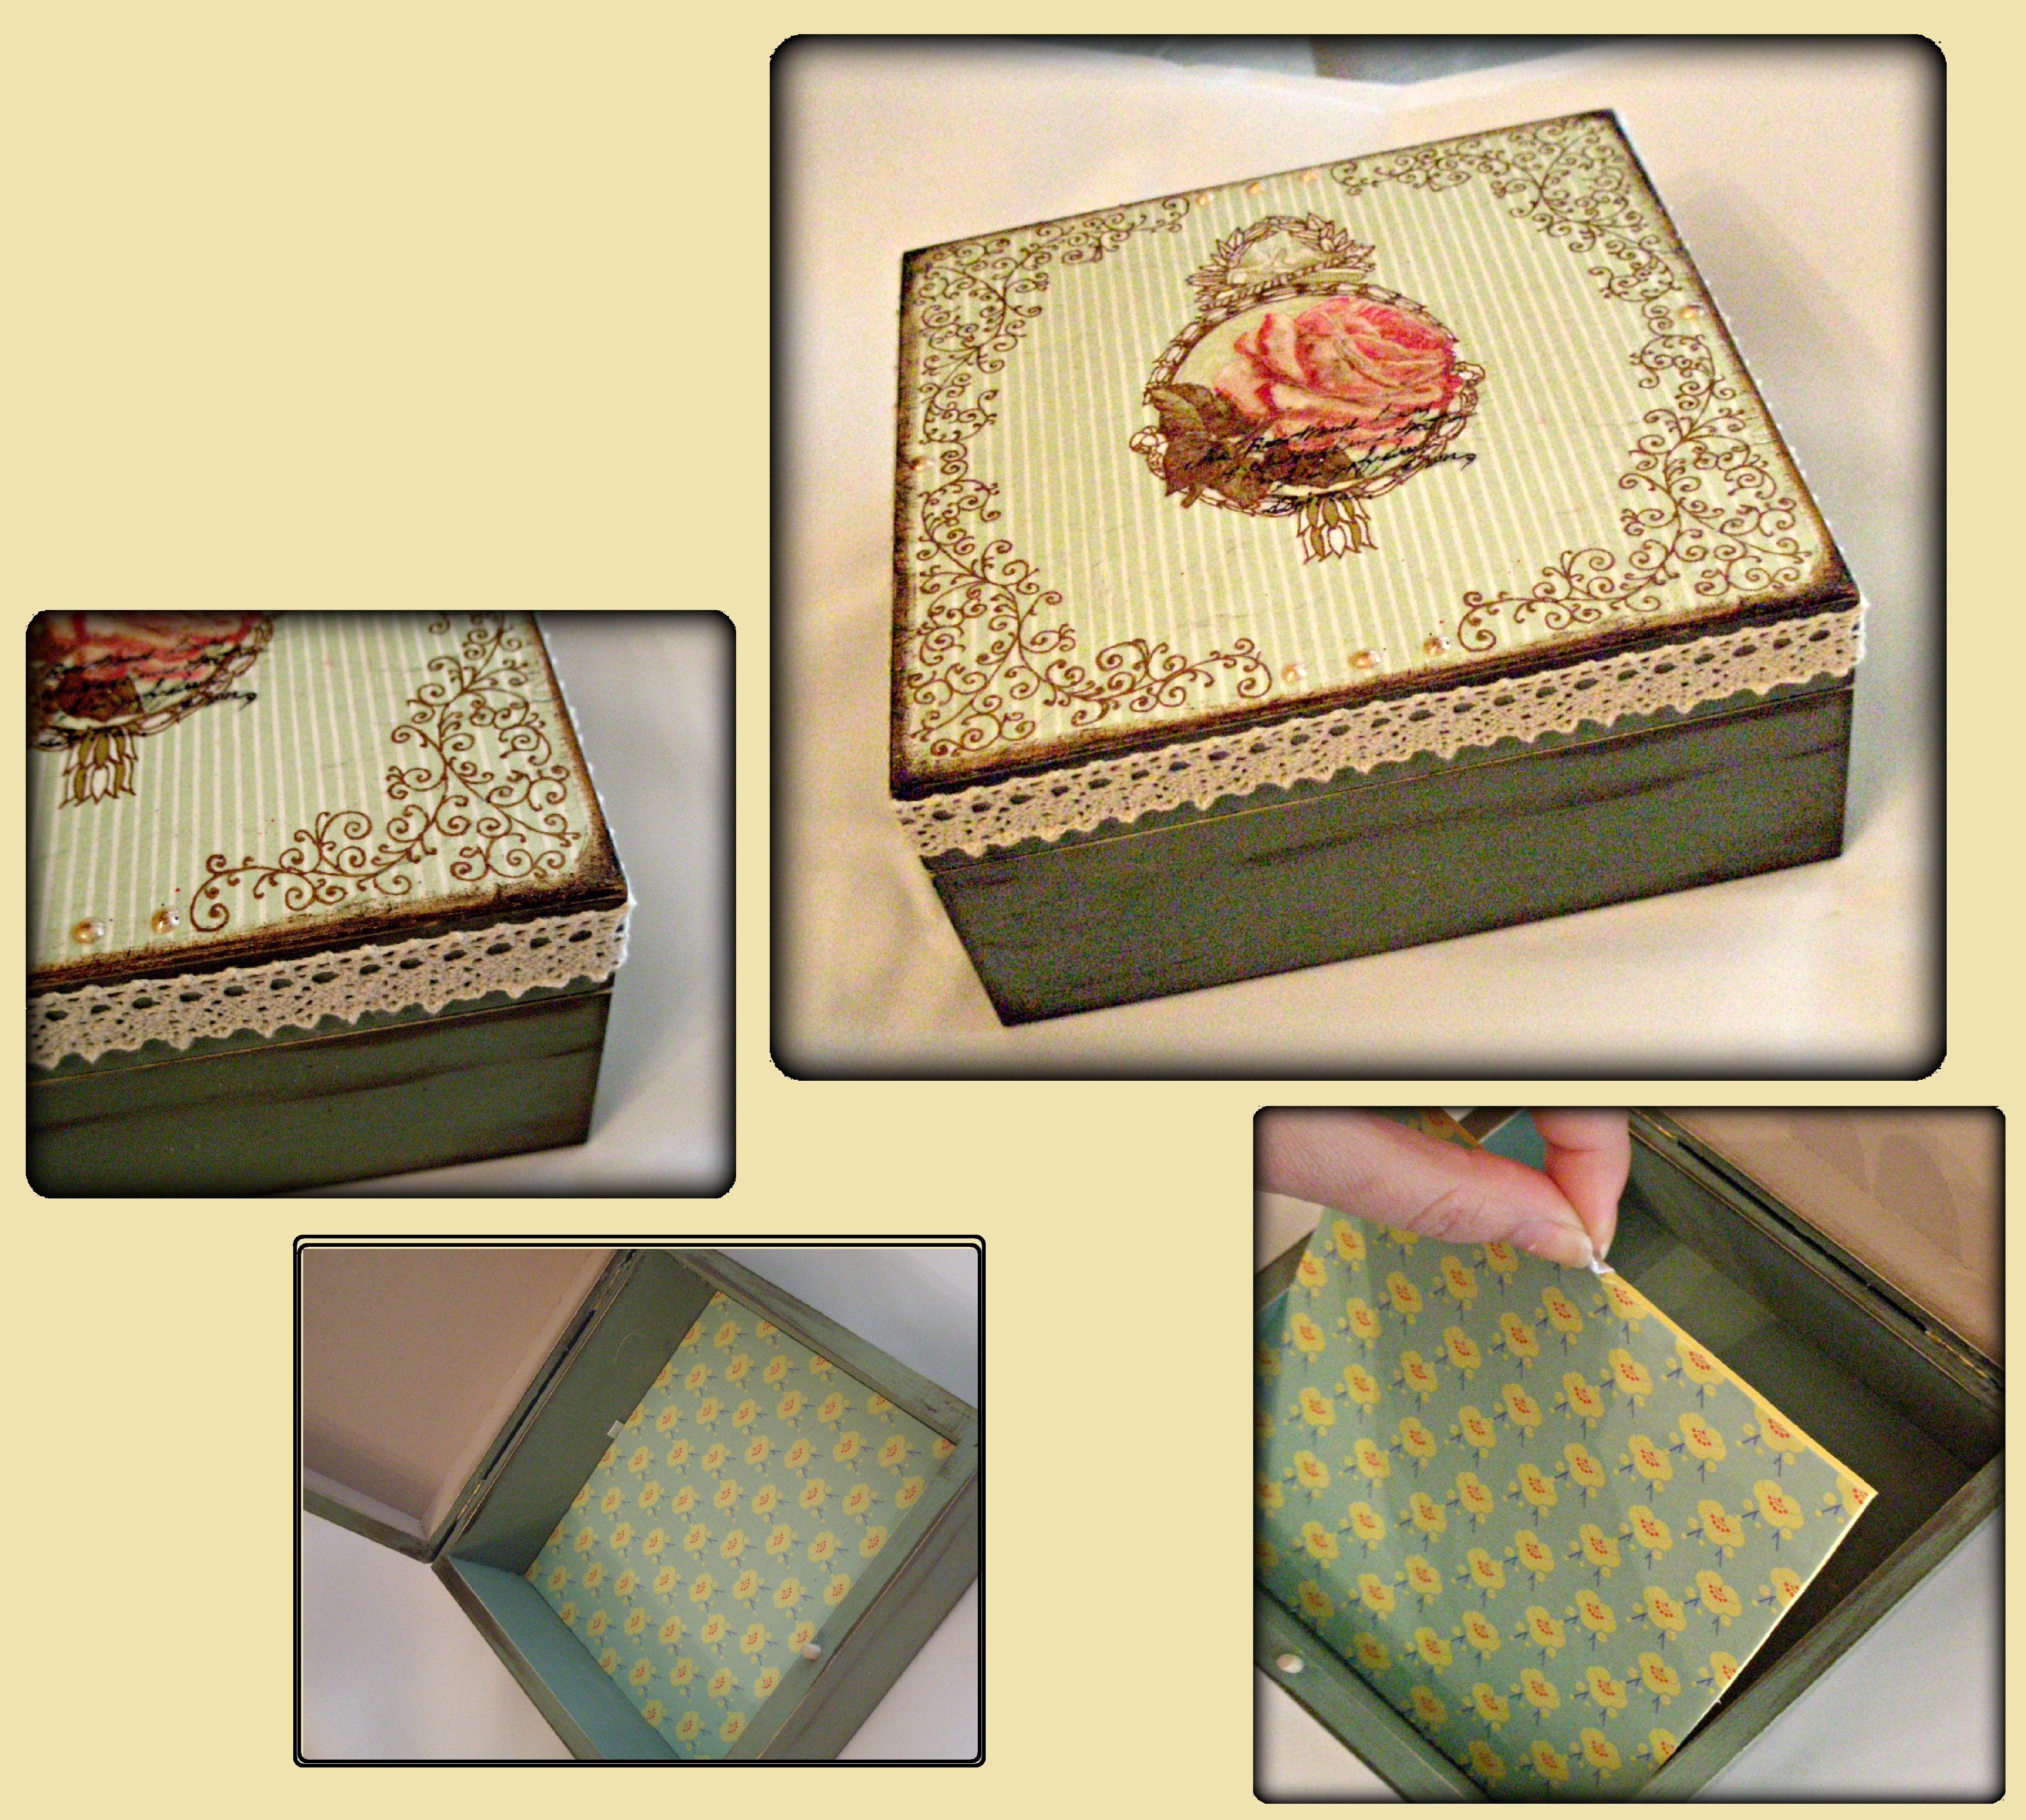 #wooden #box #vintage #retro #rose #decoupage #DIY  https://www.facebook.com/pages/Dimitras-Retro-Decoupage/532590893485180